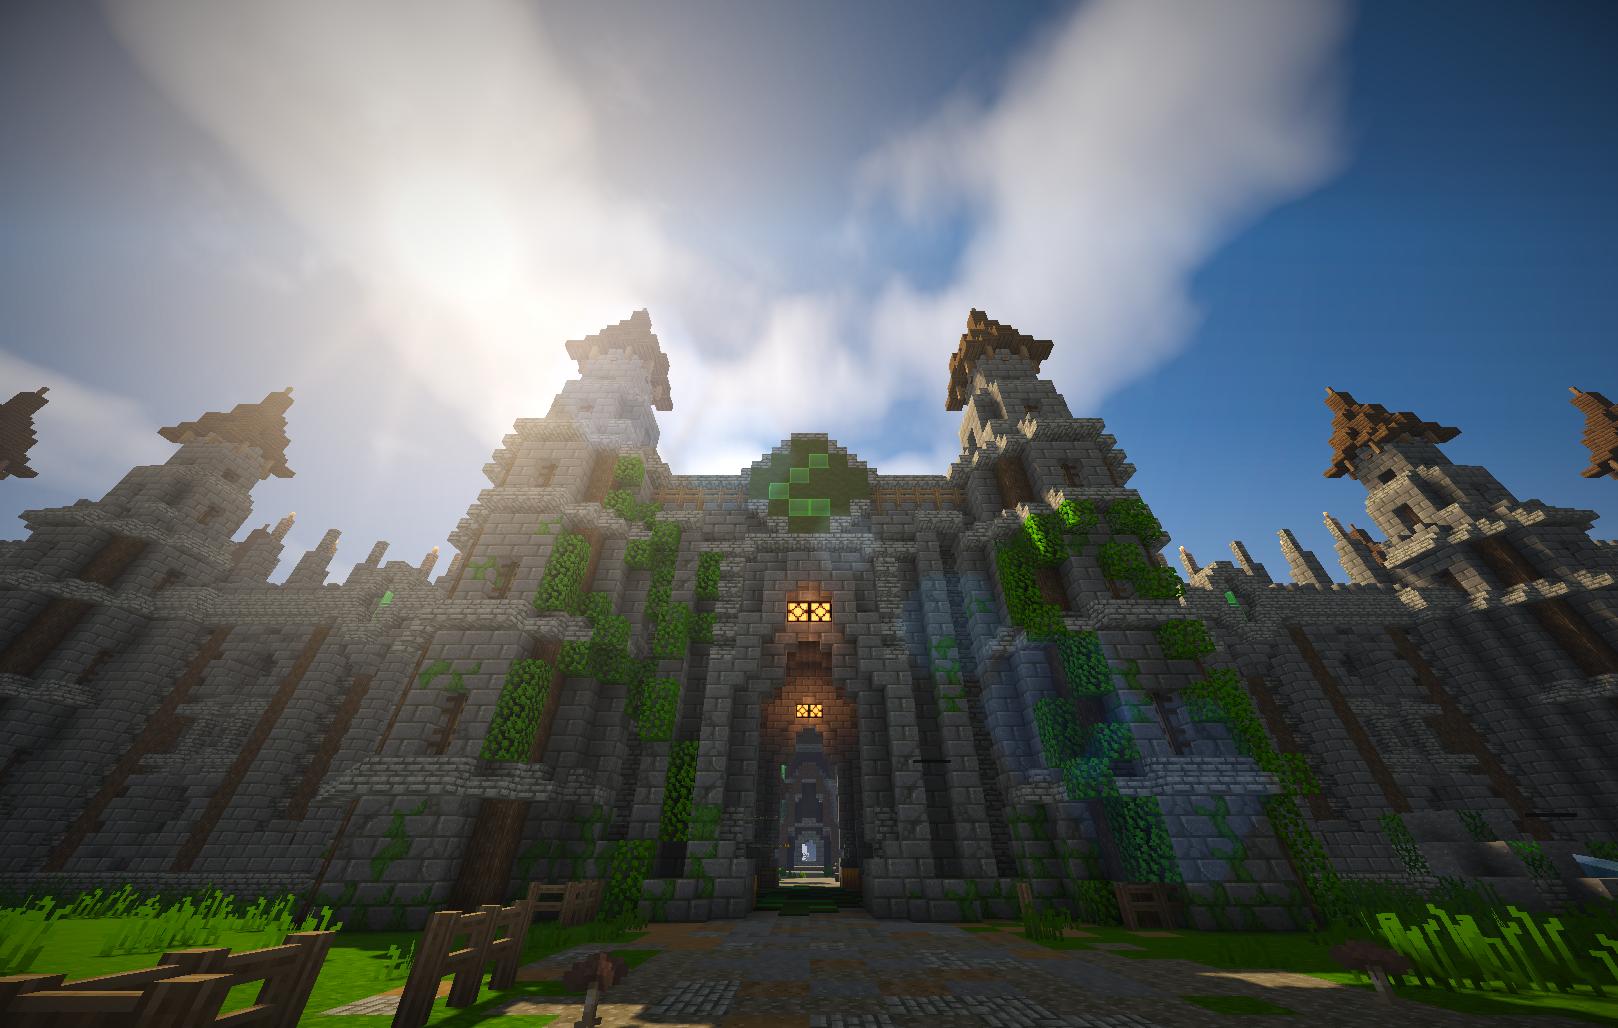 Minecraft server Wynncraft